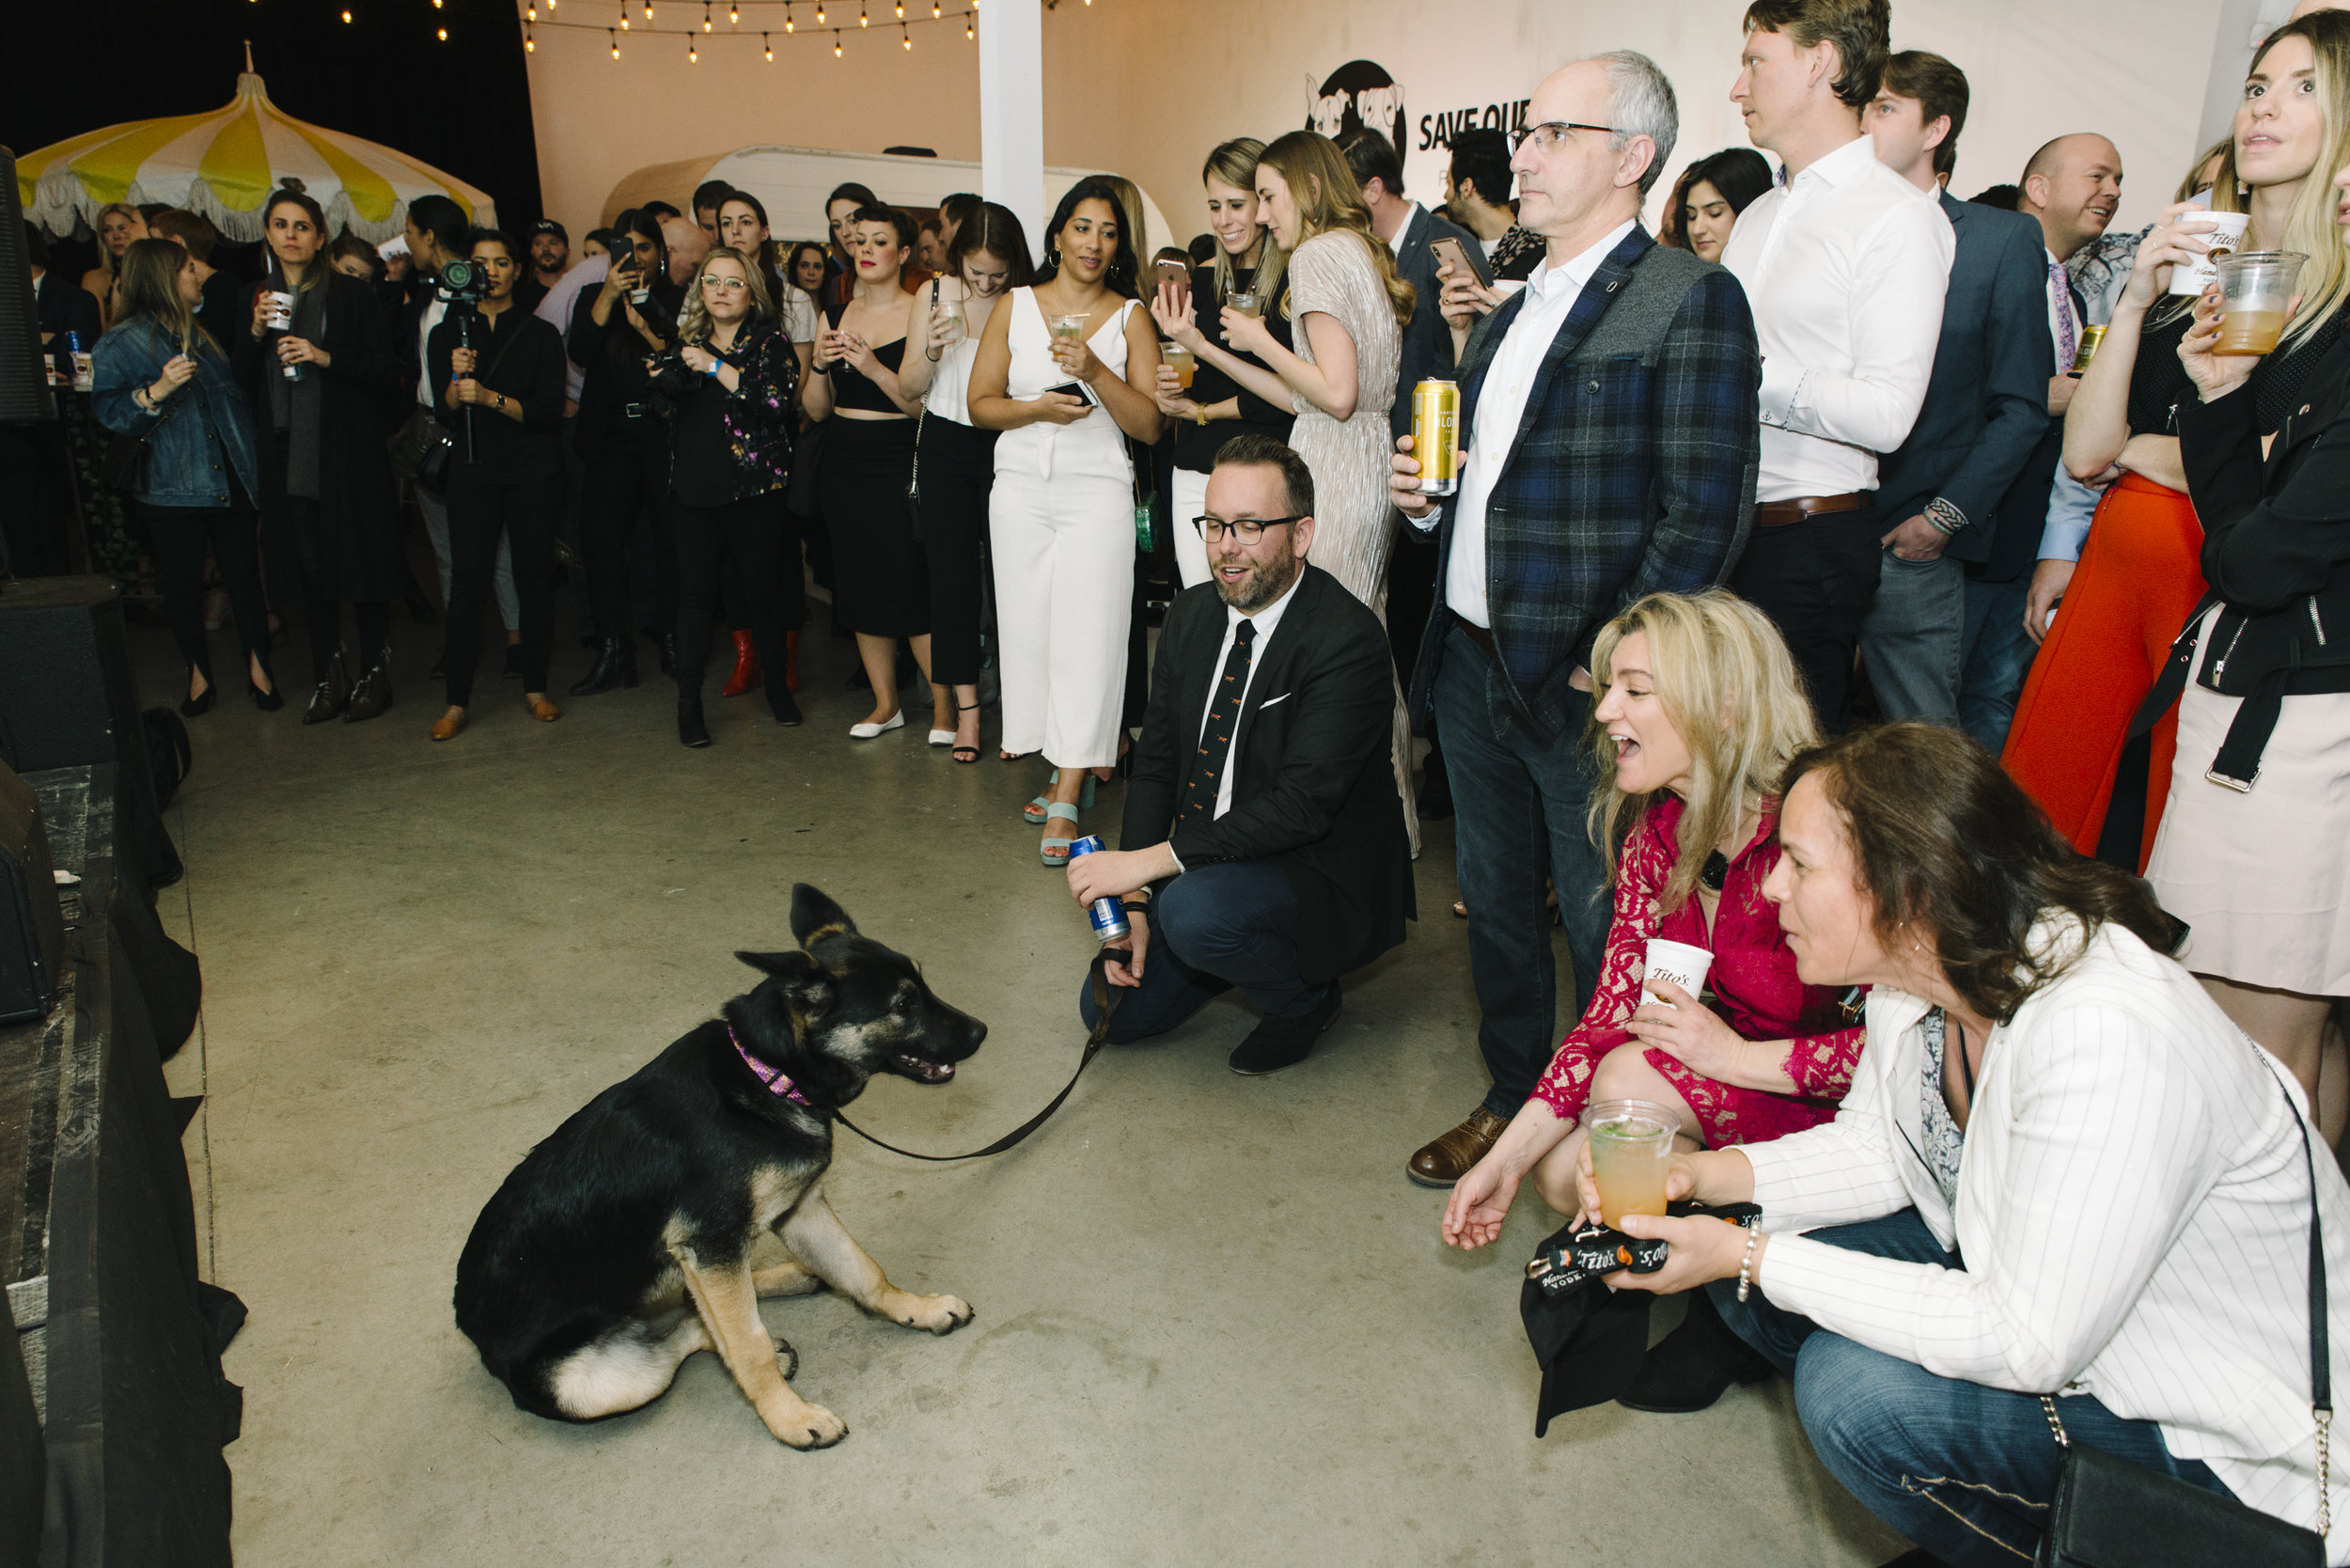 StefEthan-SaveOurScruff-ScruffSocal-SOS-DogRescue-District28Events-D28-TorontoEventPhotographer-Event-SOSDogRescue-50.JPG